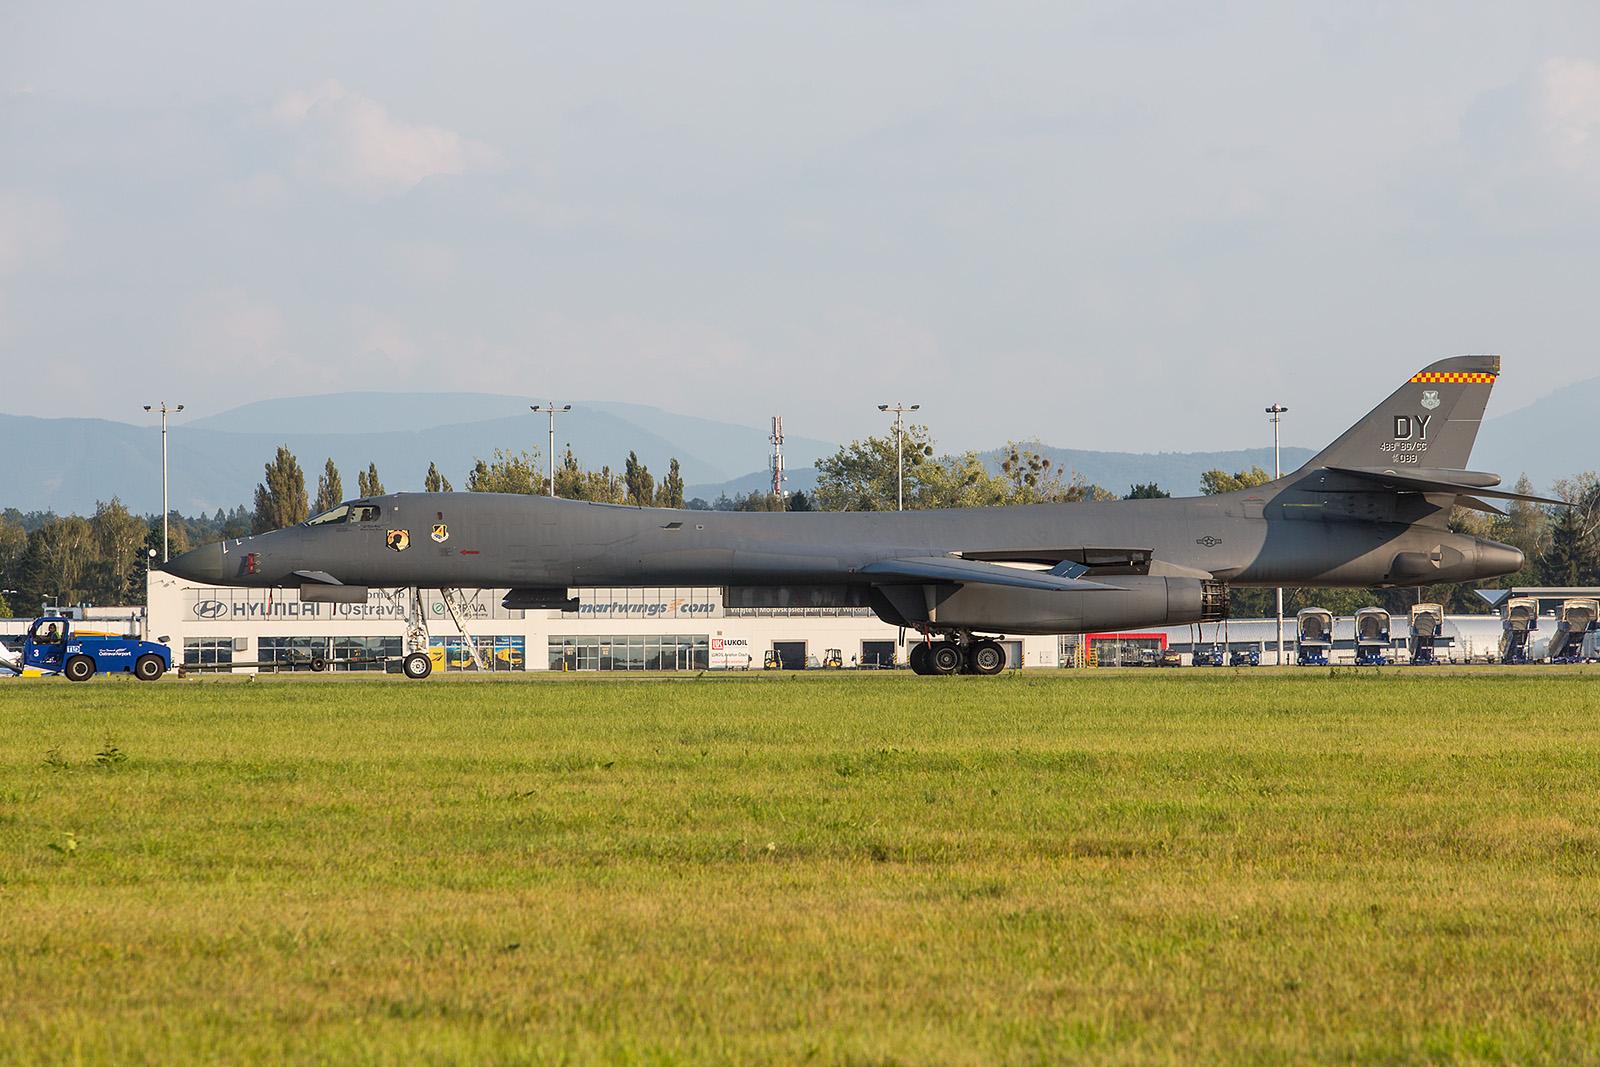 85-0089, der Cammander der 489th Bomber Group aus Dyess.